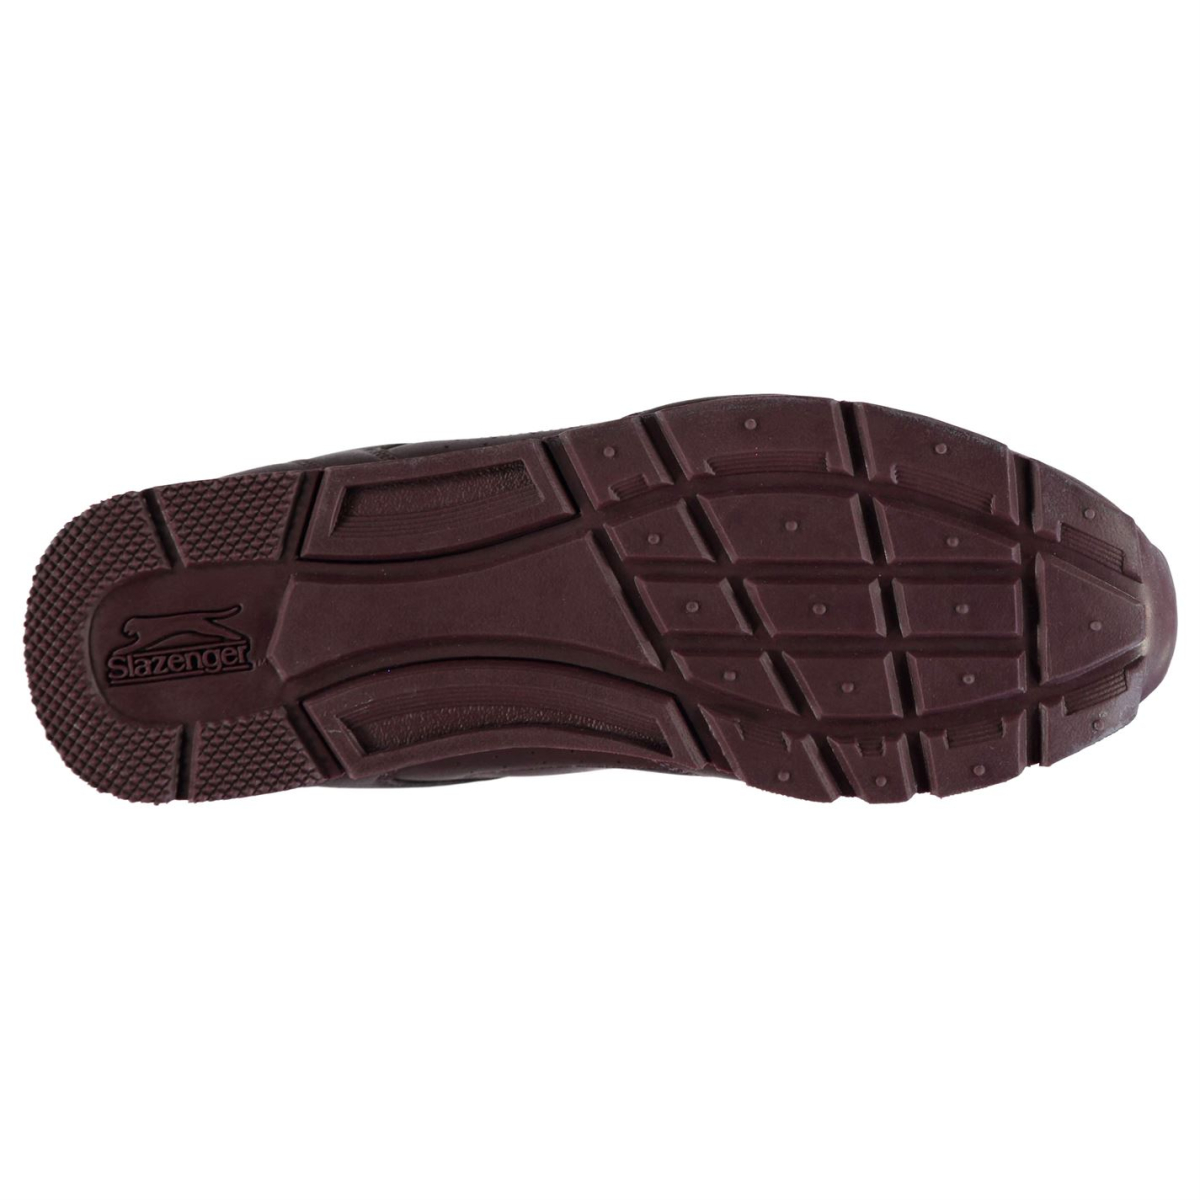 Slazenger-Classic-Turnschuhe-Laufschuhe-Damen-Sportschuhe-Sneaker-1265 Indexbild 6